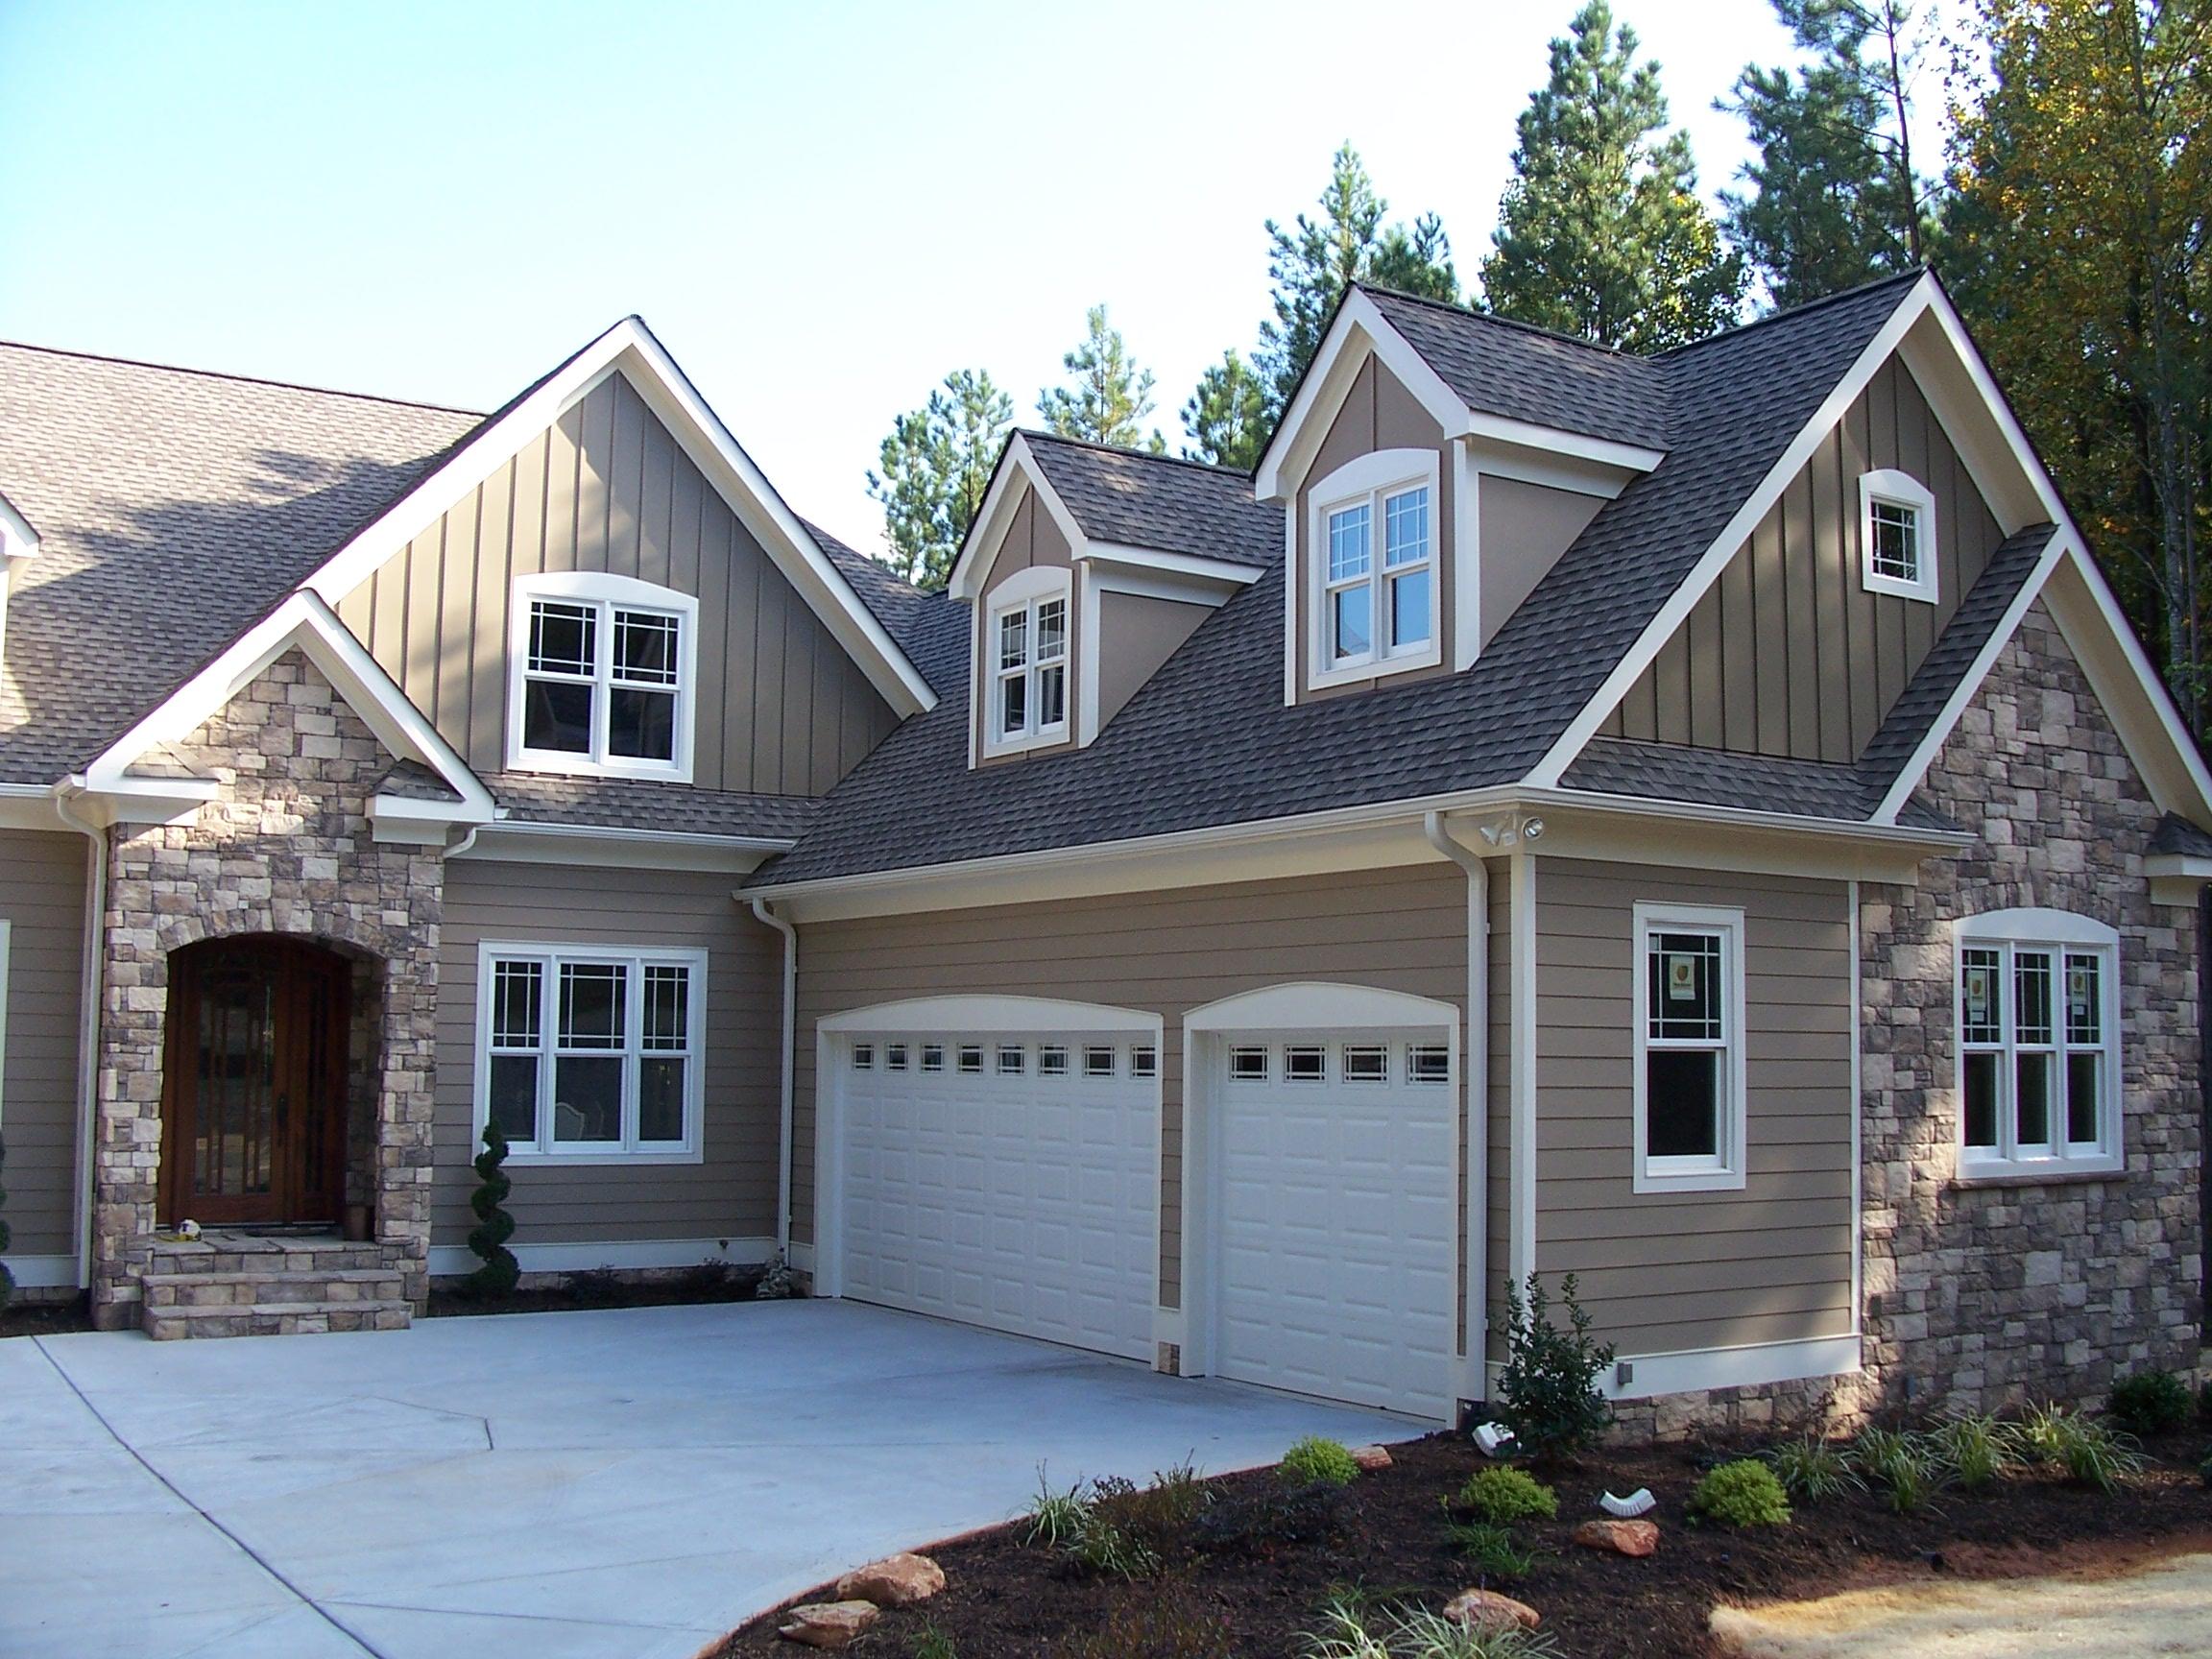 exterior paint colors for house photo - 2